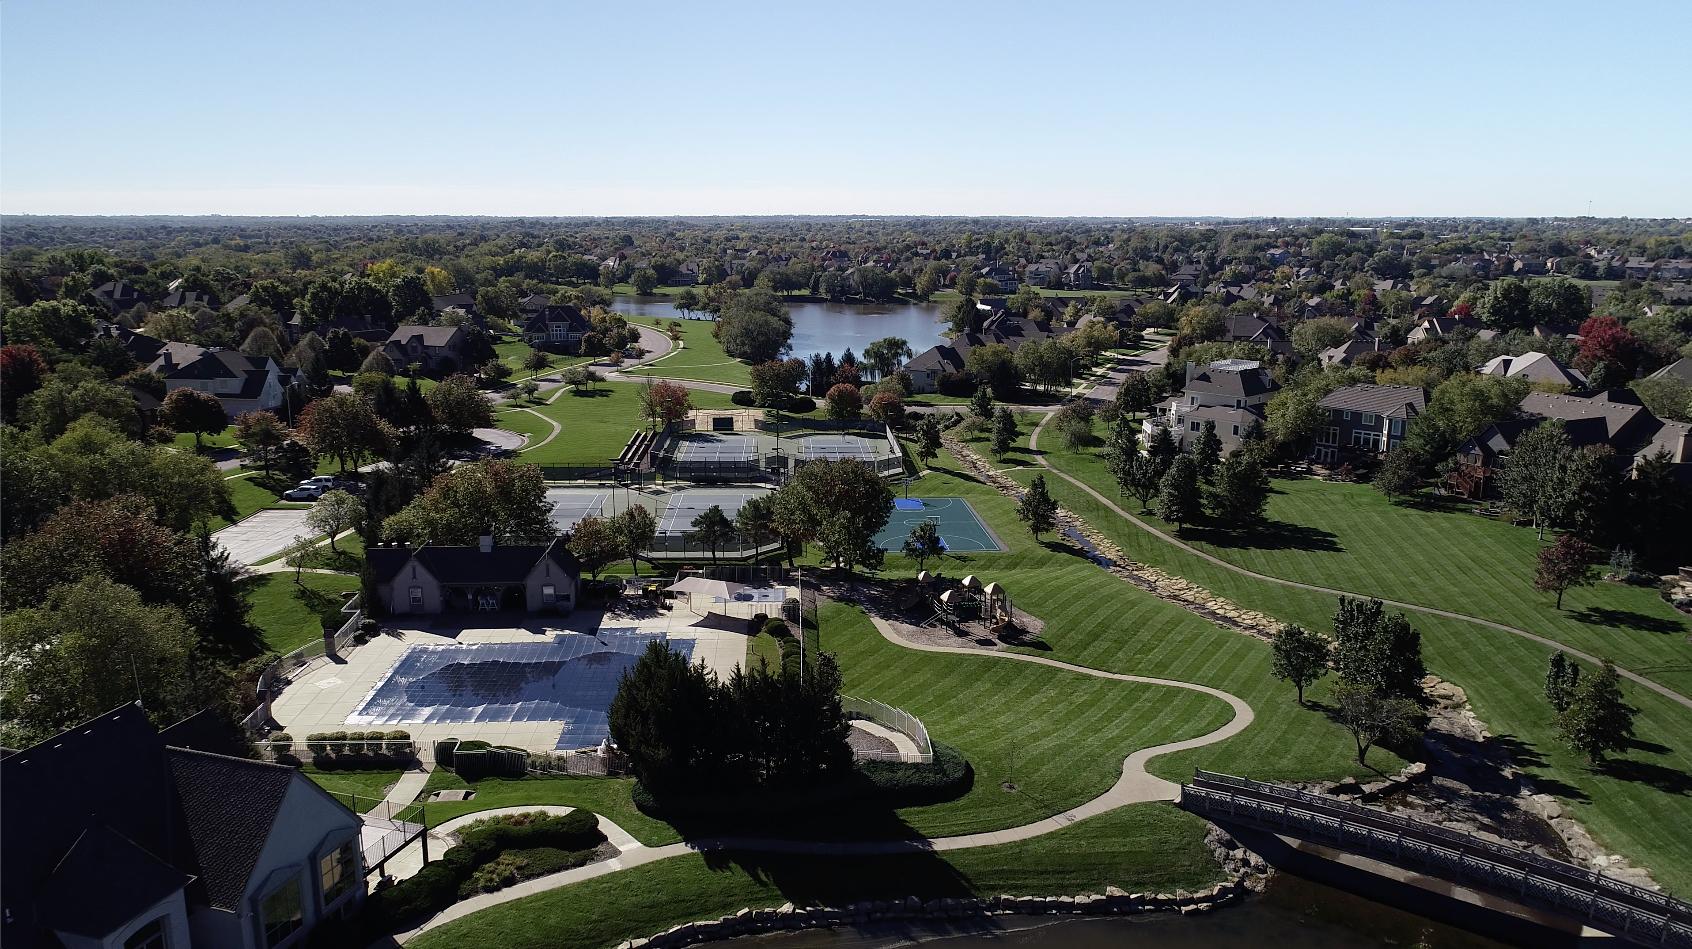 Lionsgate Overland Park KS